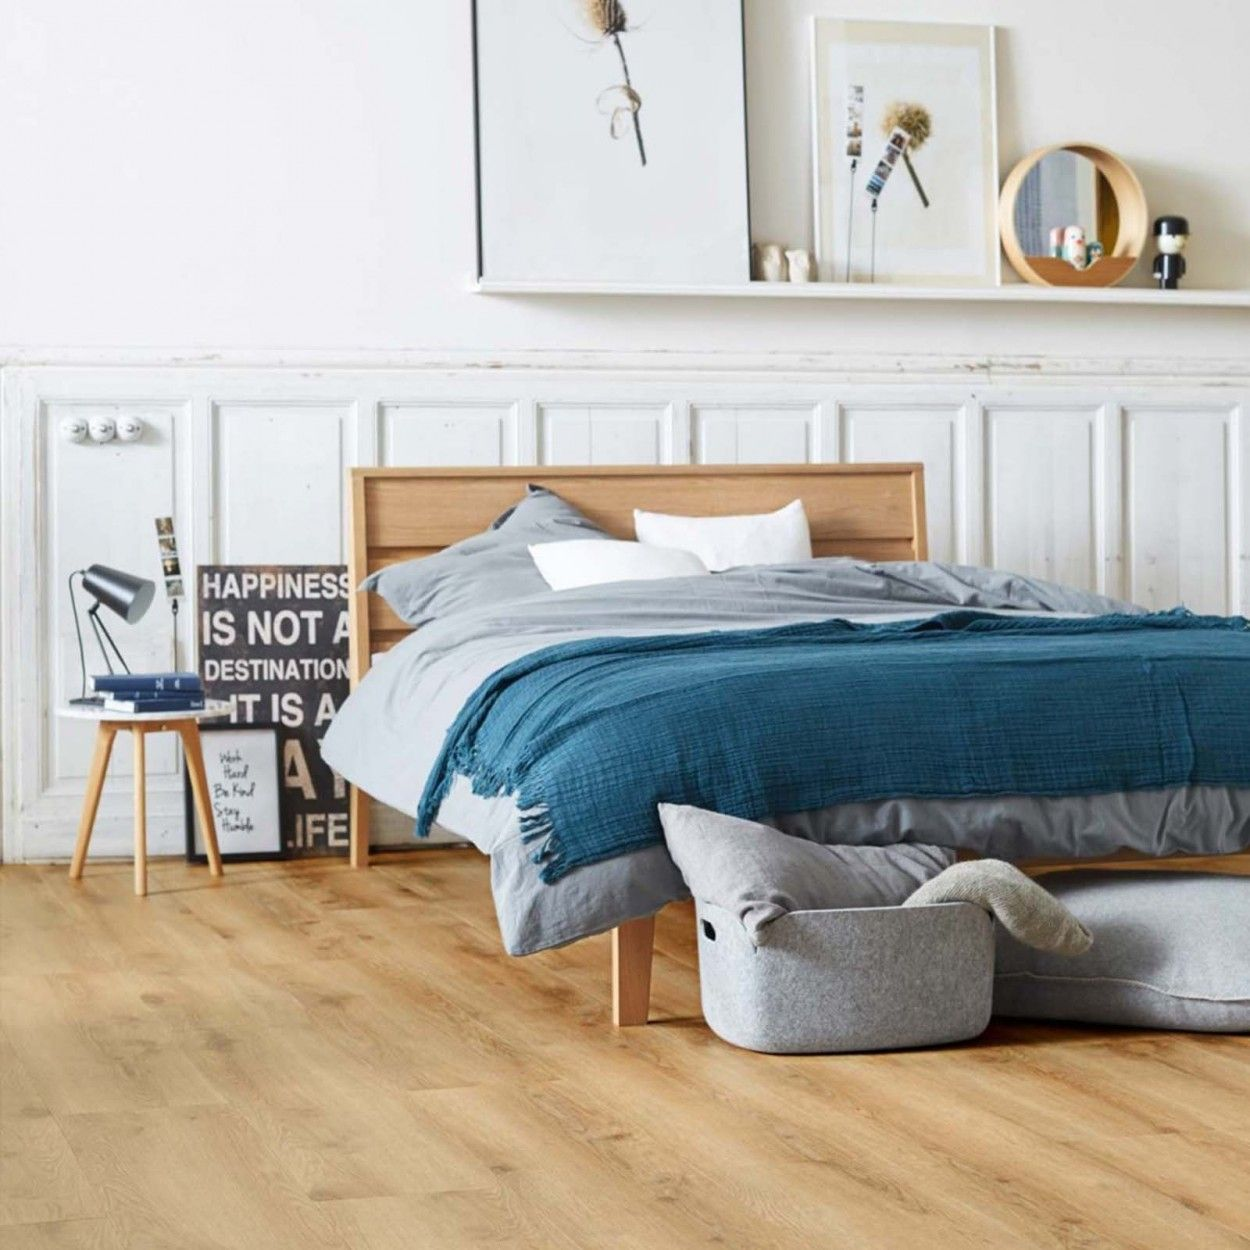 Decorating The Kids Room How To Choose The Right Floor Bricoflor Uk Blog In 2020 Luxury Vinyl Click Flooring Interior Design Bedroom Flooring